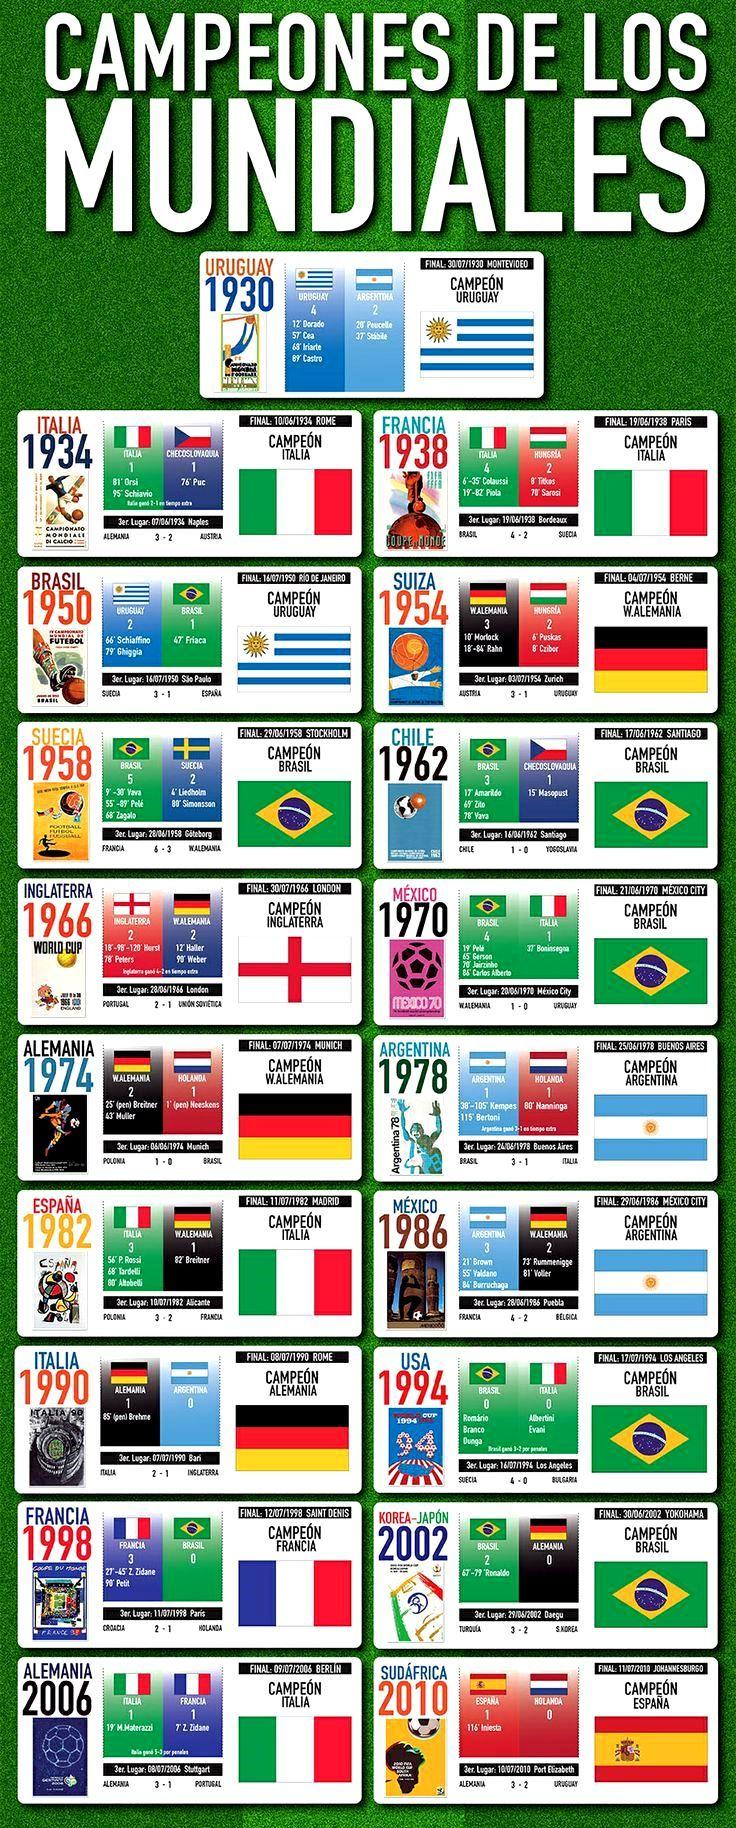 Campeones Mundiales Campeonato Mundial De Futbol Balones De Futbol Dibujo Copa Mundial De Futbol